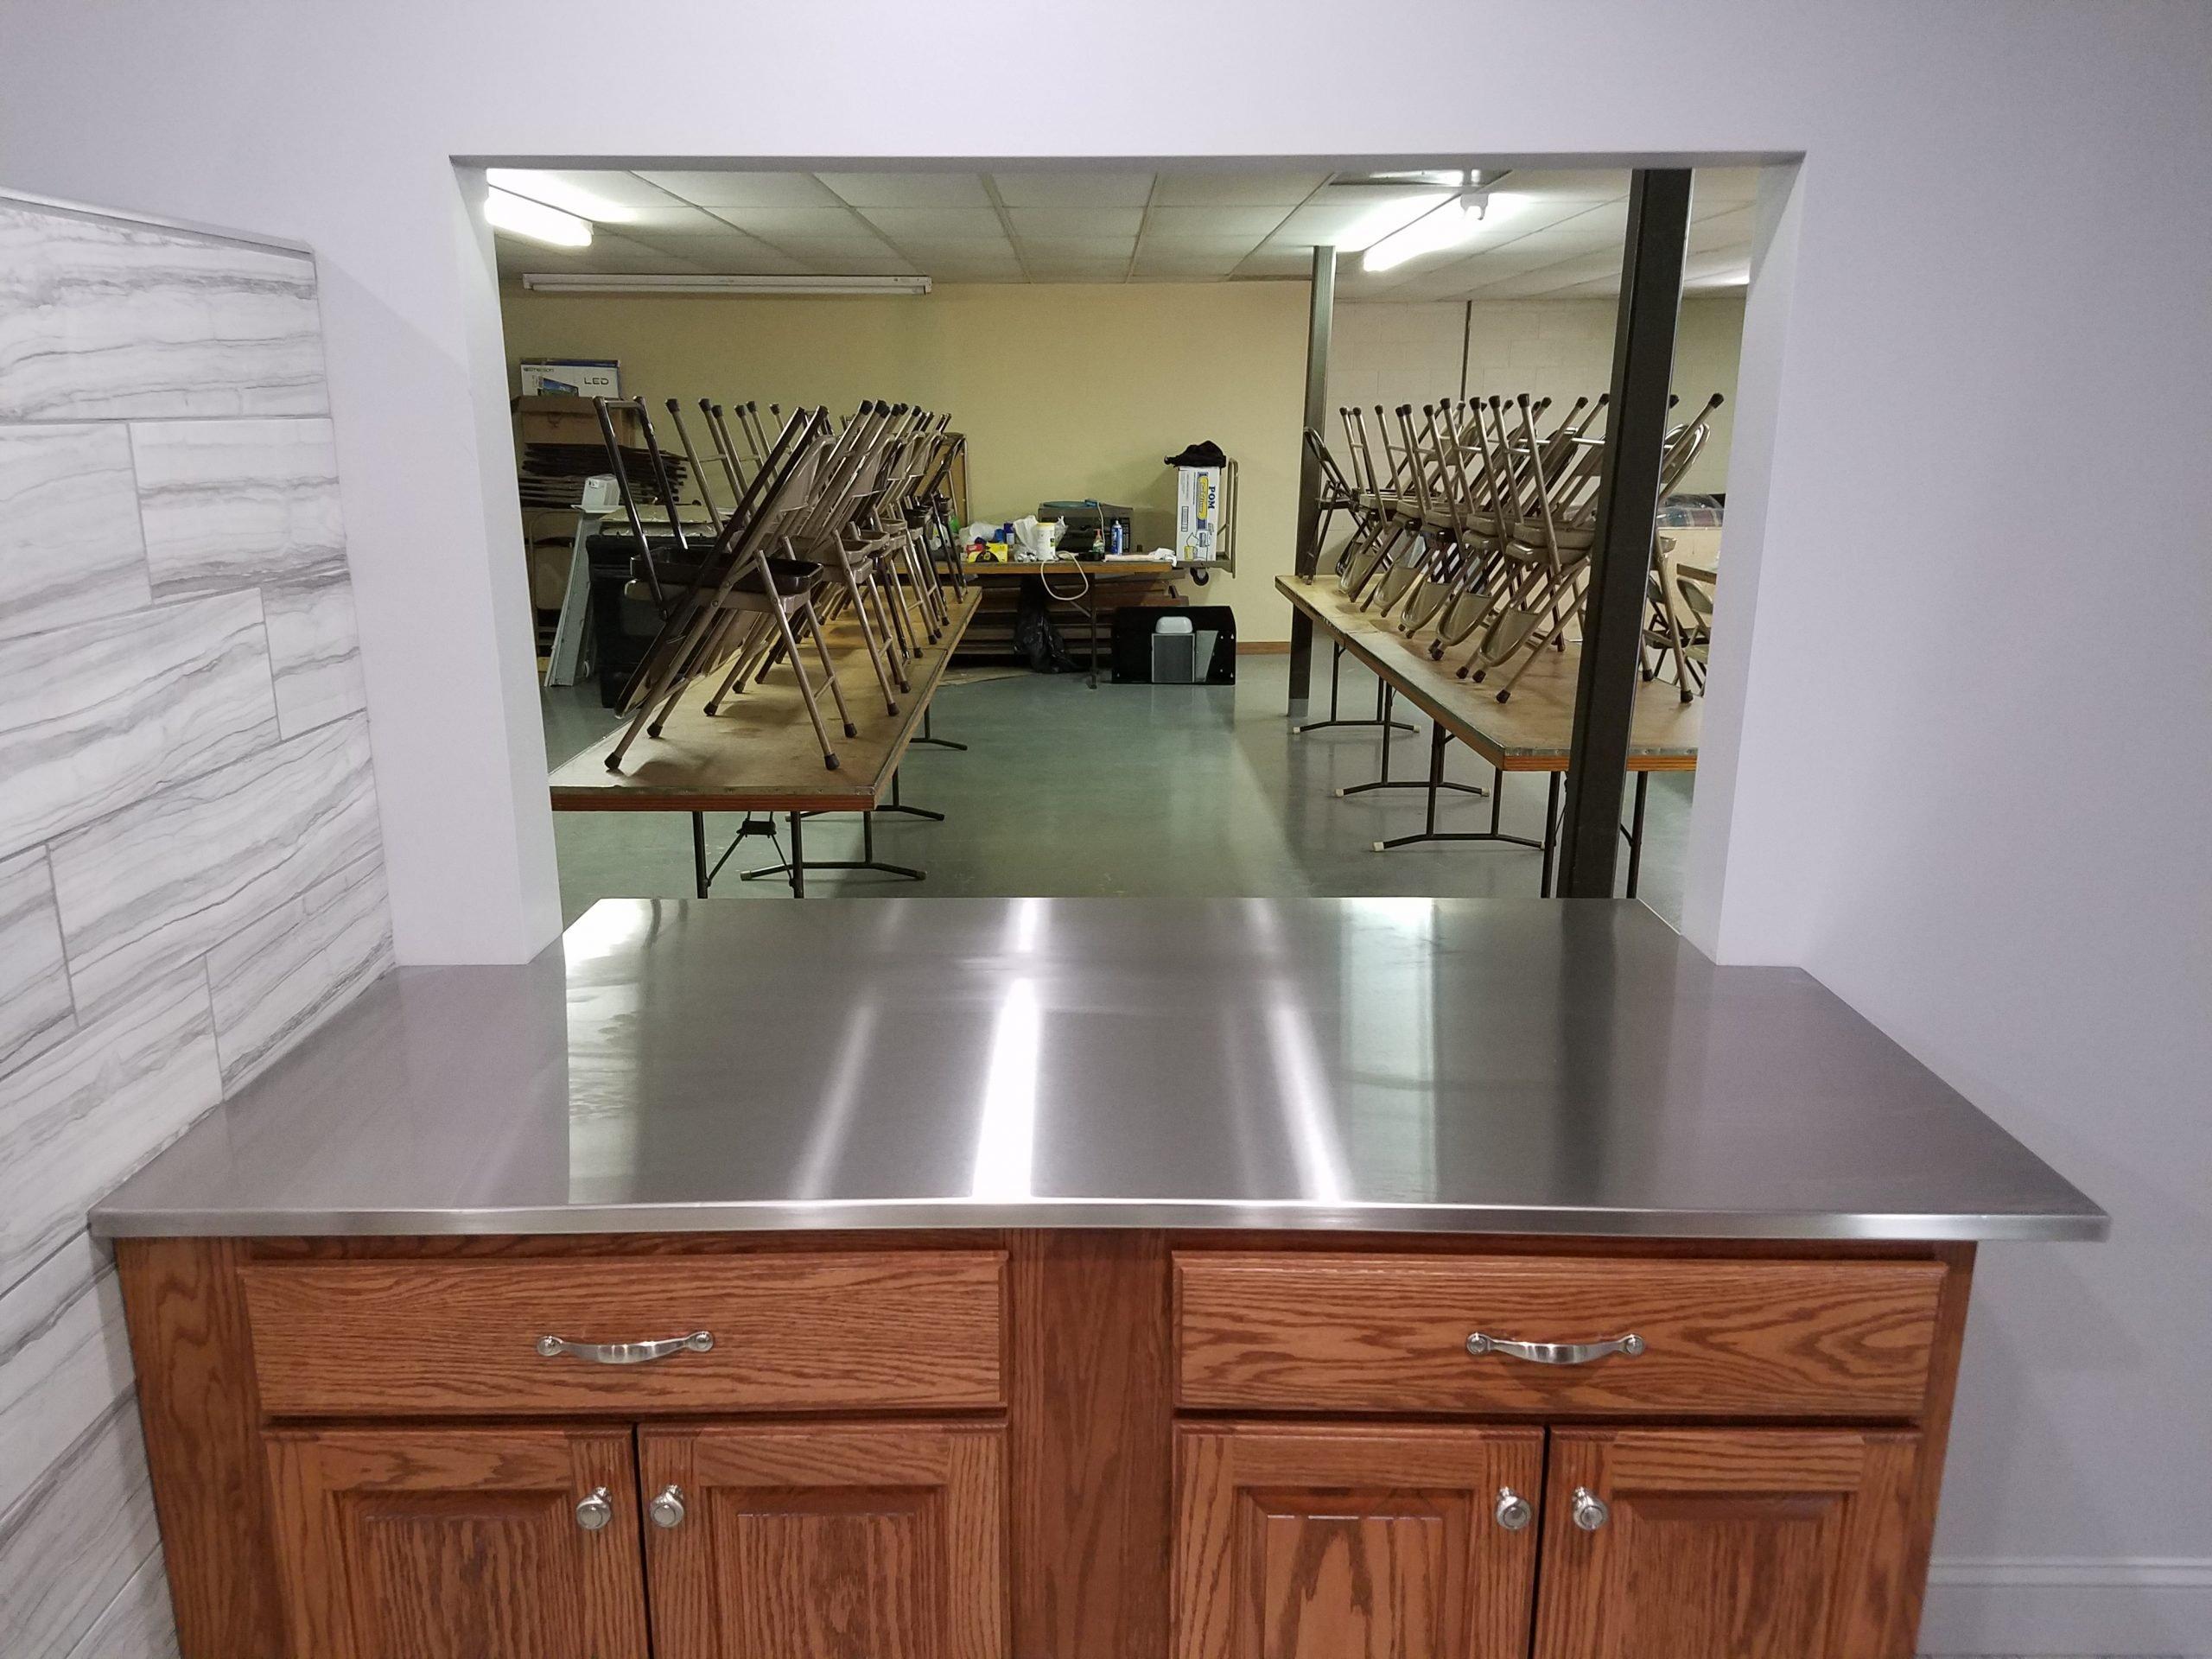 Lodge Custom Stainless Steel Pass Thru Counter Top